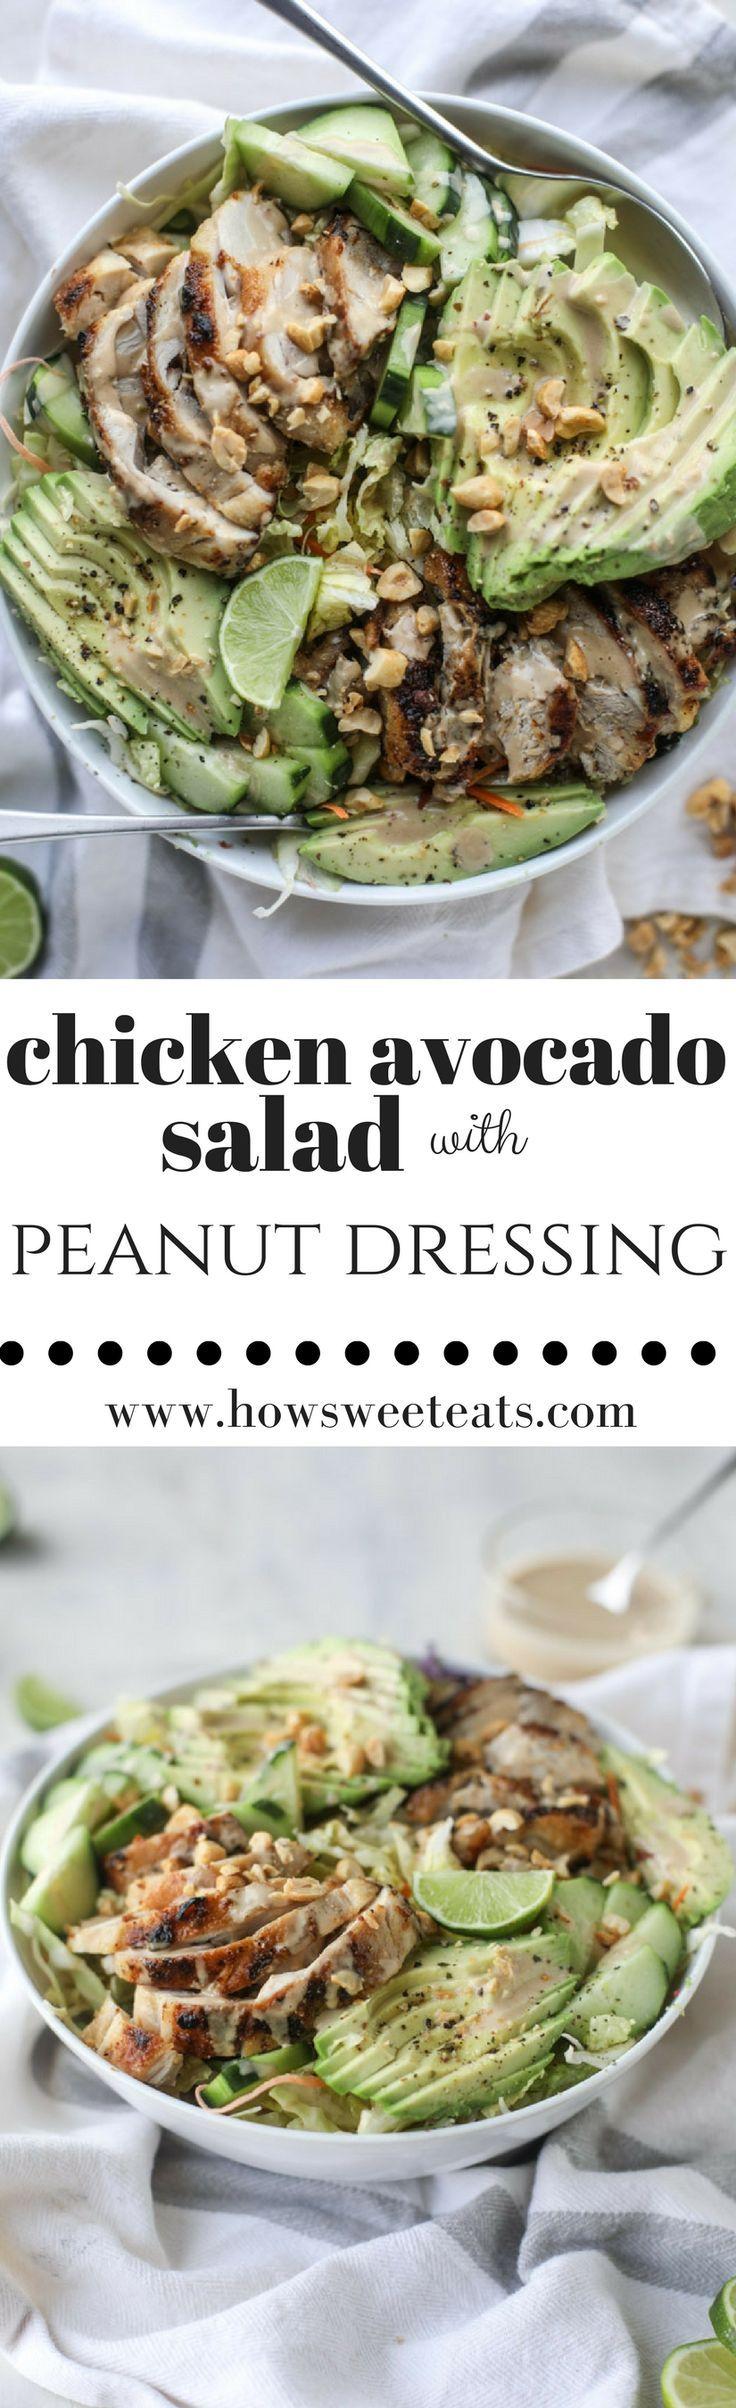 Chicken Avocado Salad with Peanut Dressing I howsweeteats.com